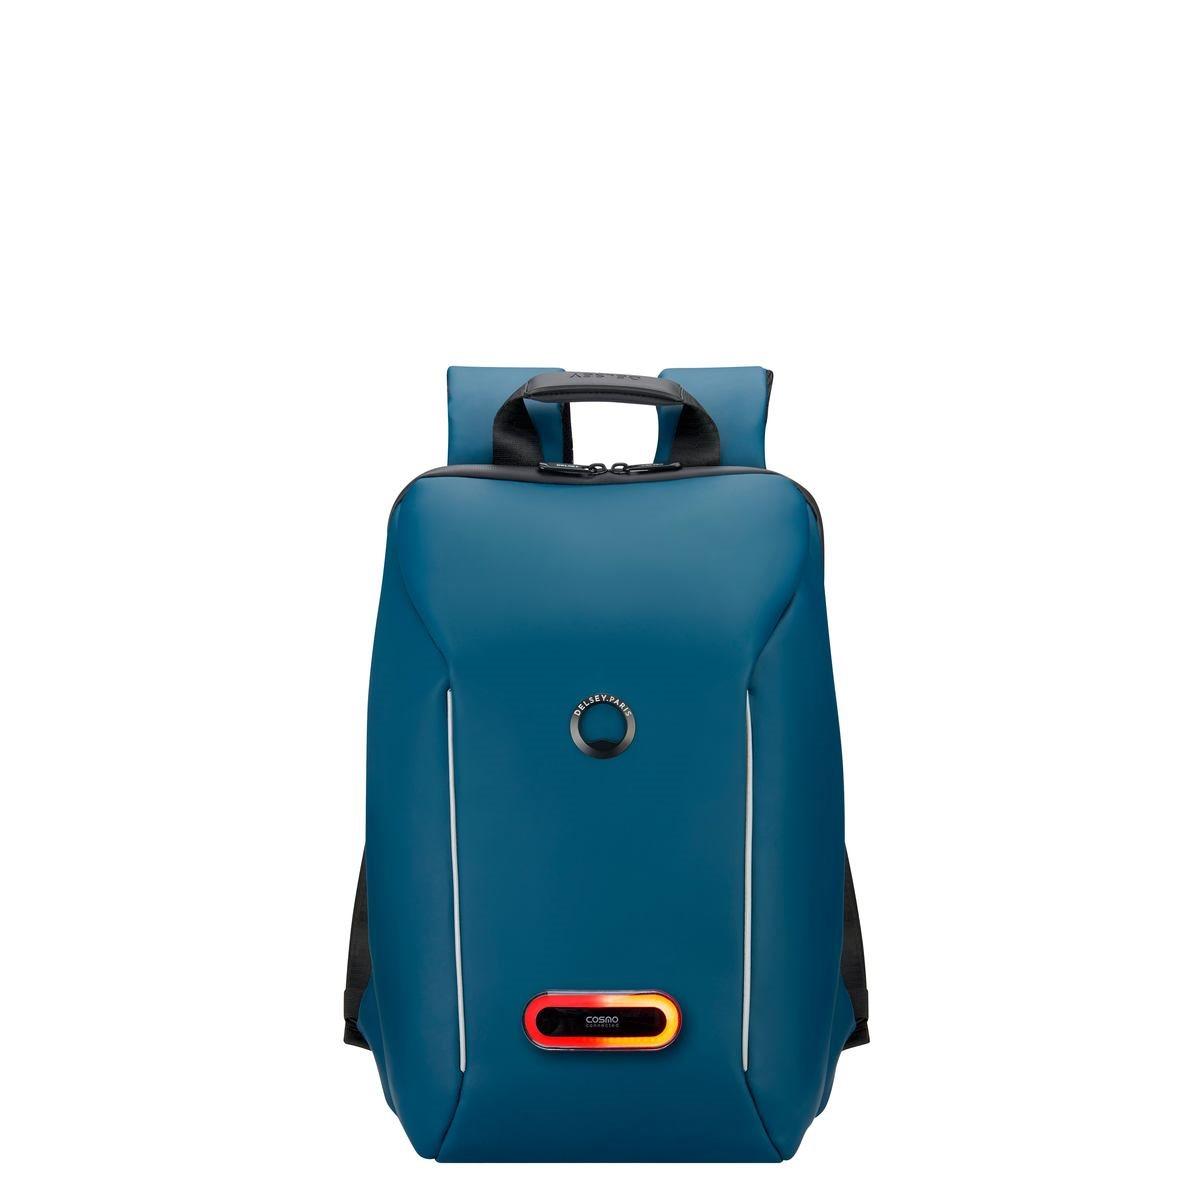 Delsey Σακίδιο πλάτης με θέση PC 14   44,5x29,5x16,5cm Securain Connected Blue